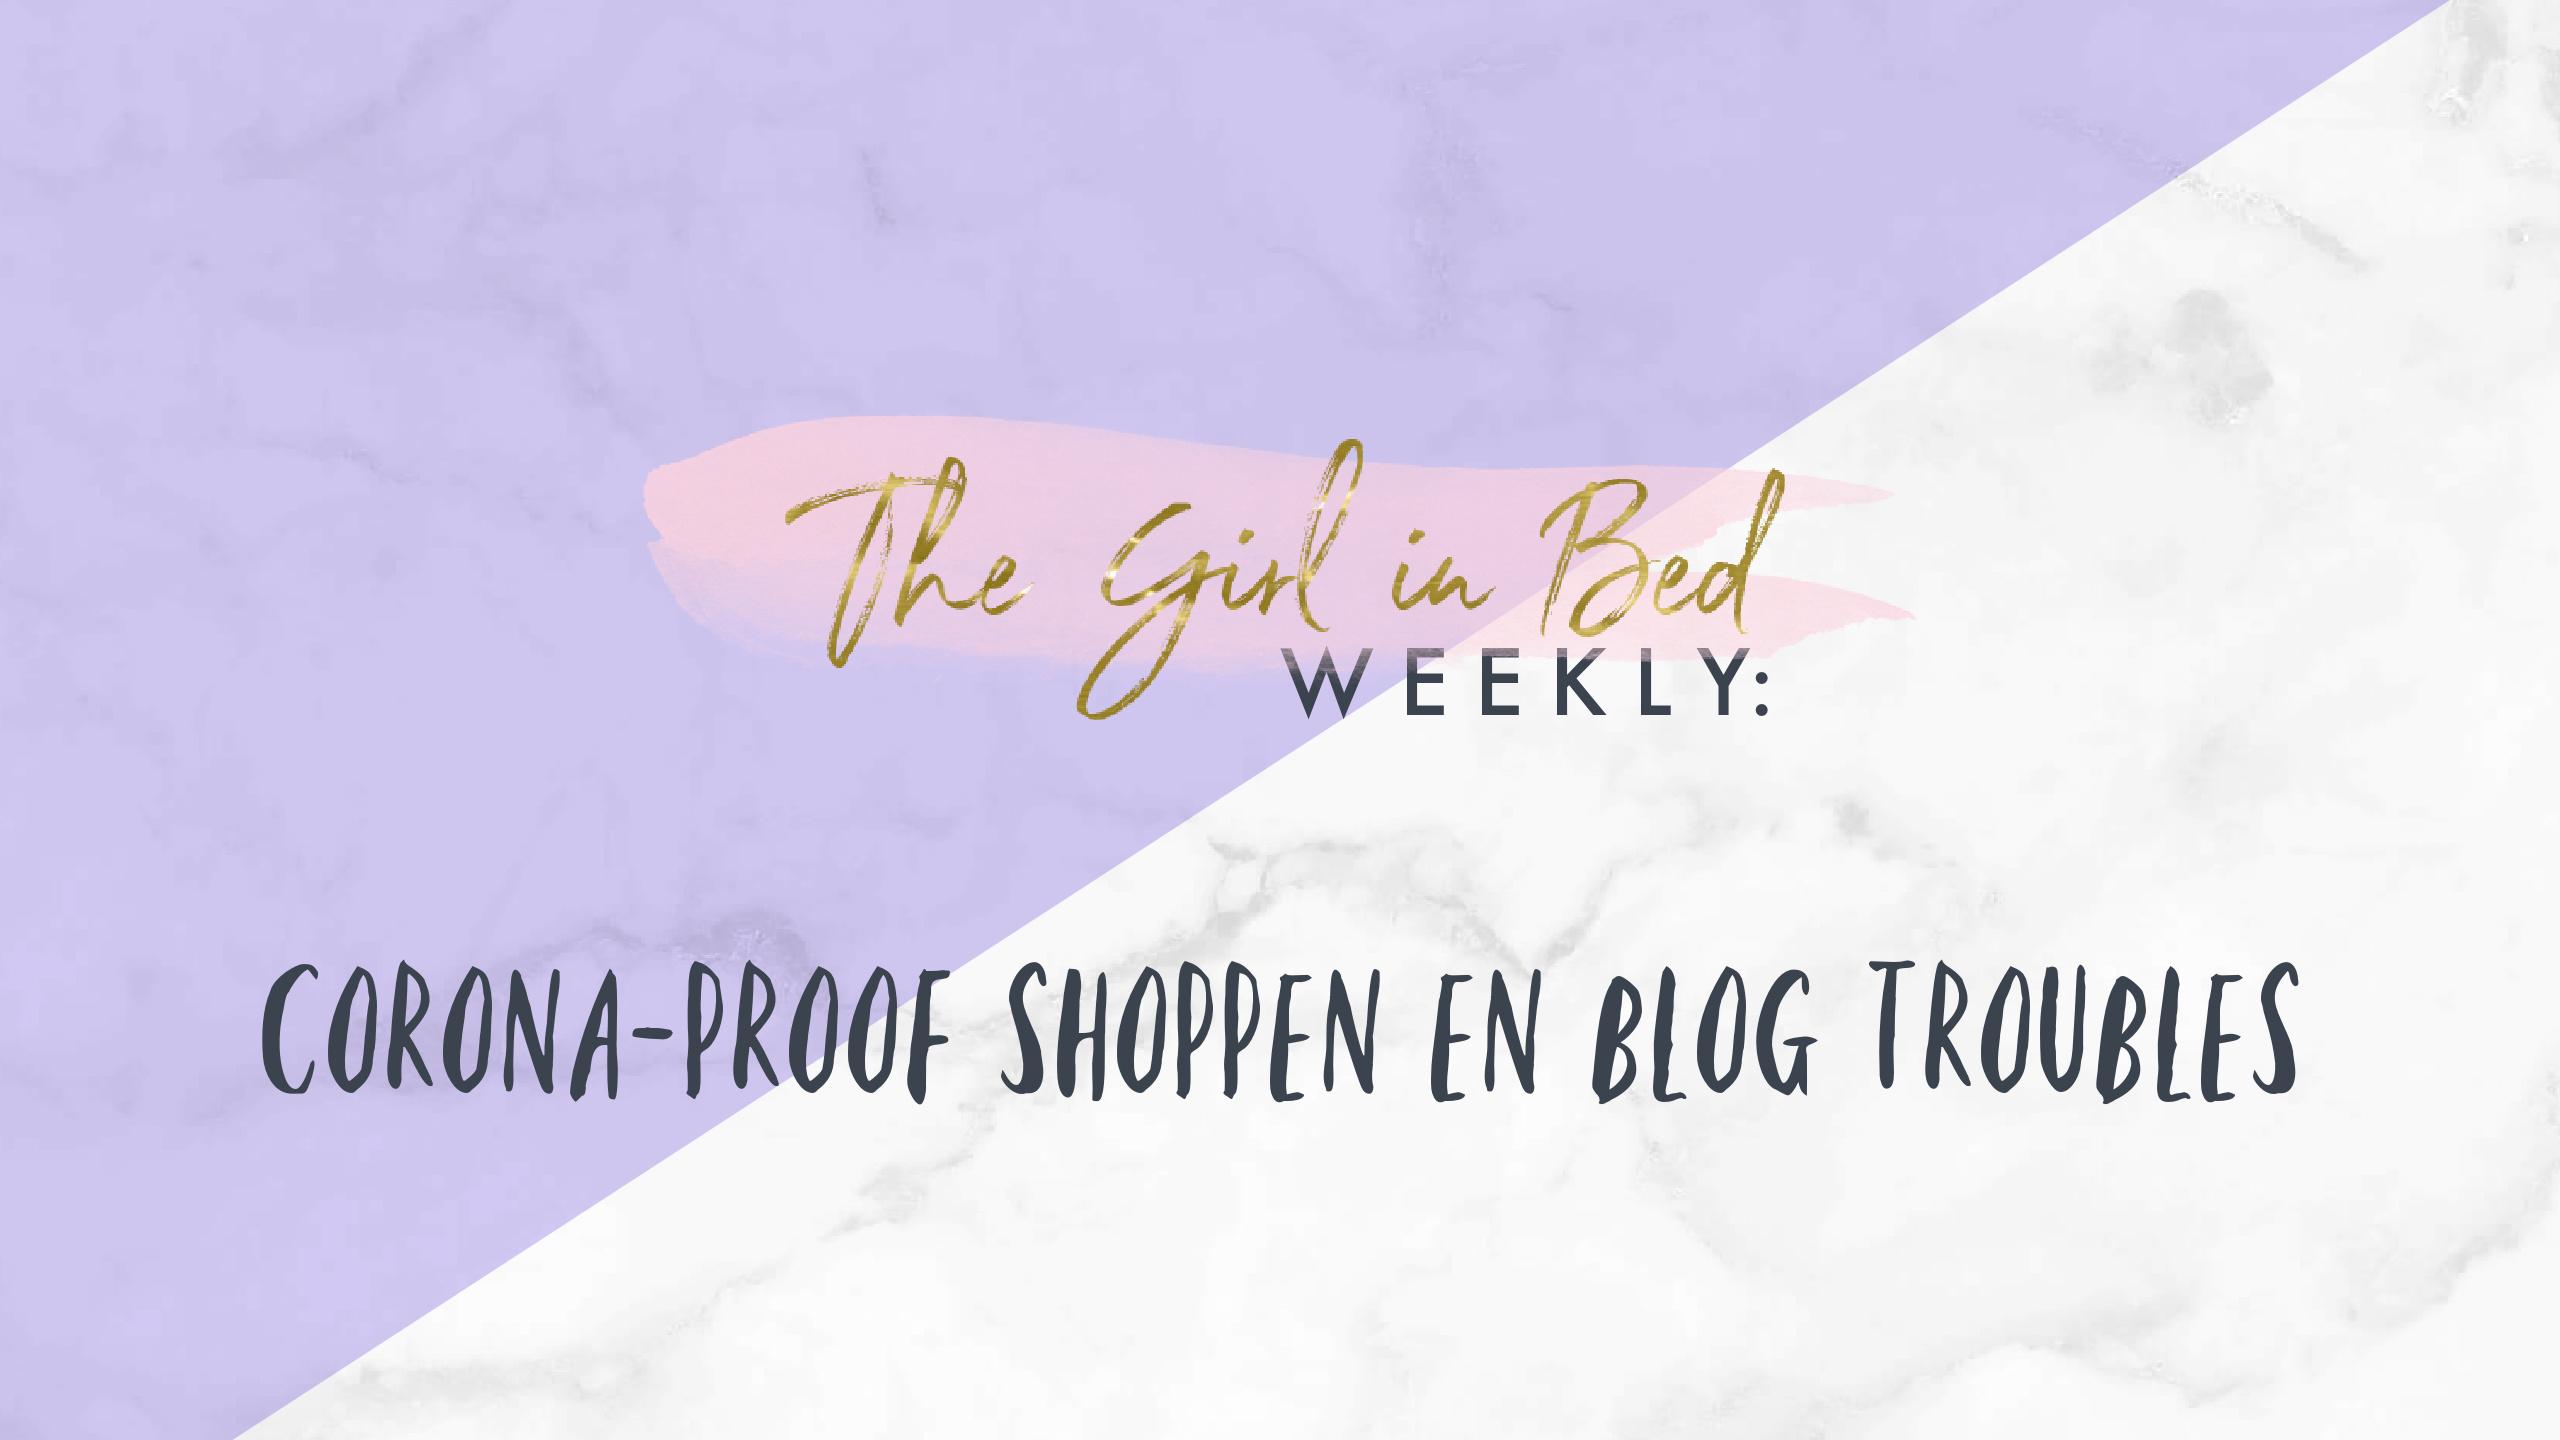 Corona-proof shoppen en blog troubles